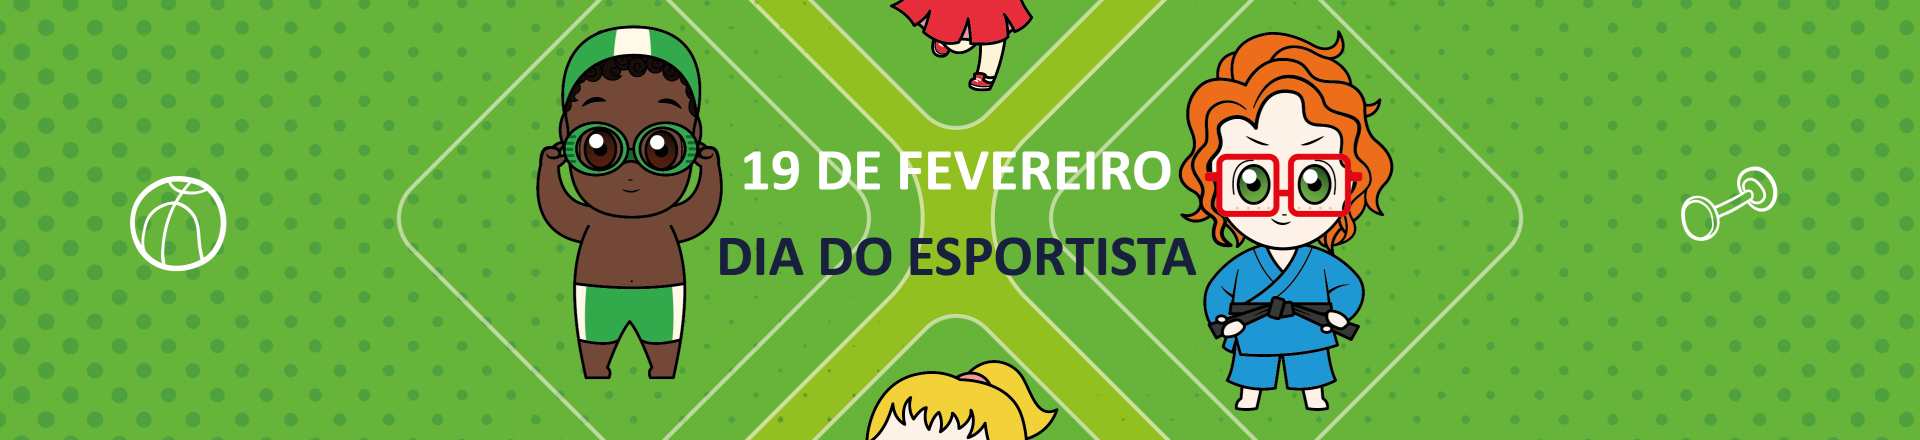 19 de Fevereiro - Dia do Esportista